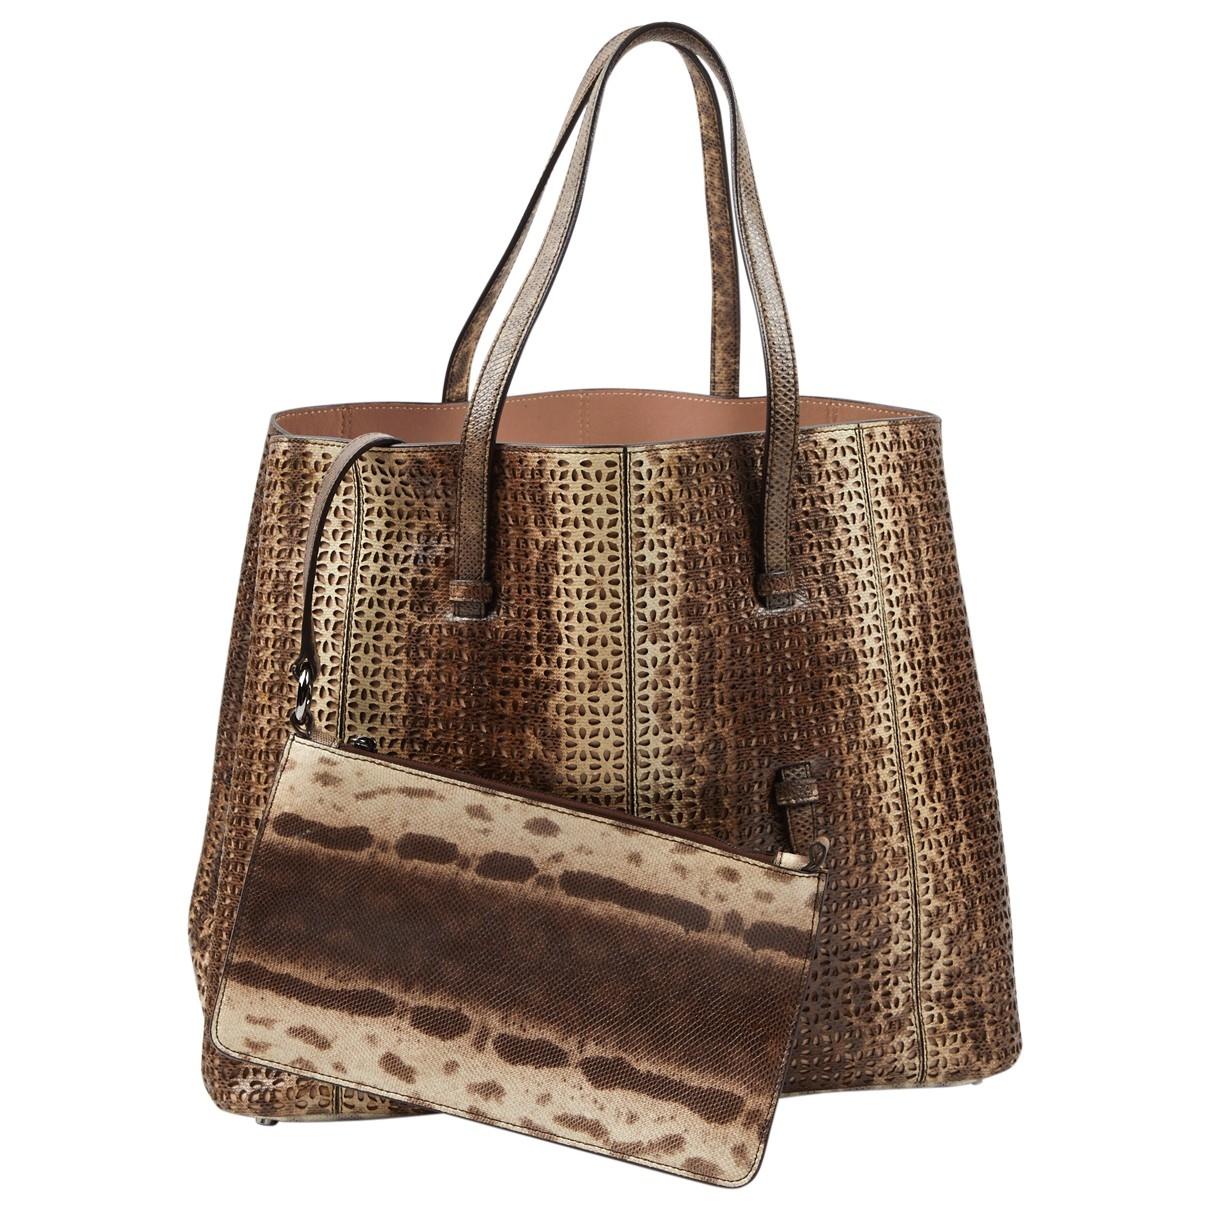 Alaïa \N Brown Leather handbag for Women \N